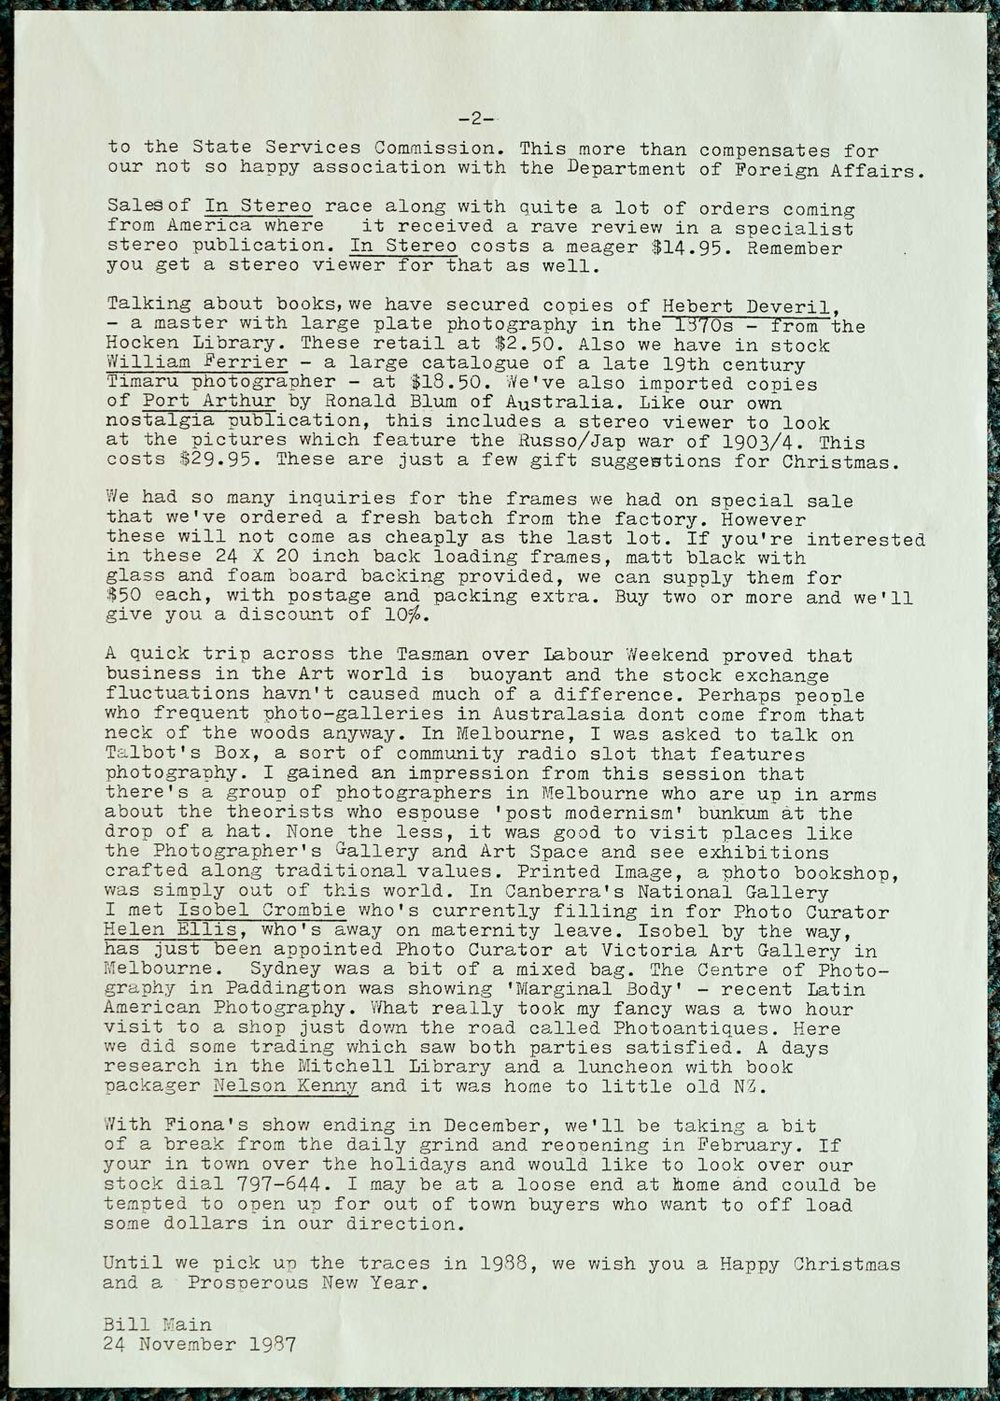 Exposures Gallery Newsletter No.16, 24 November 1987